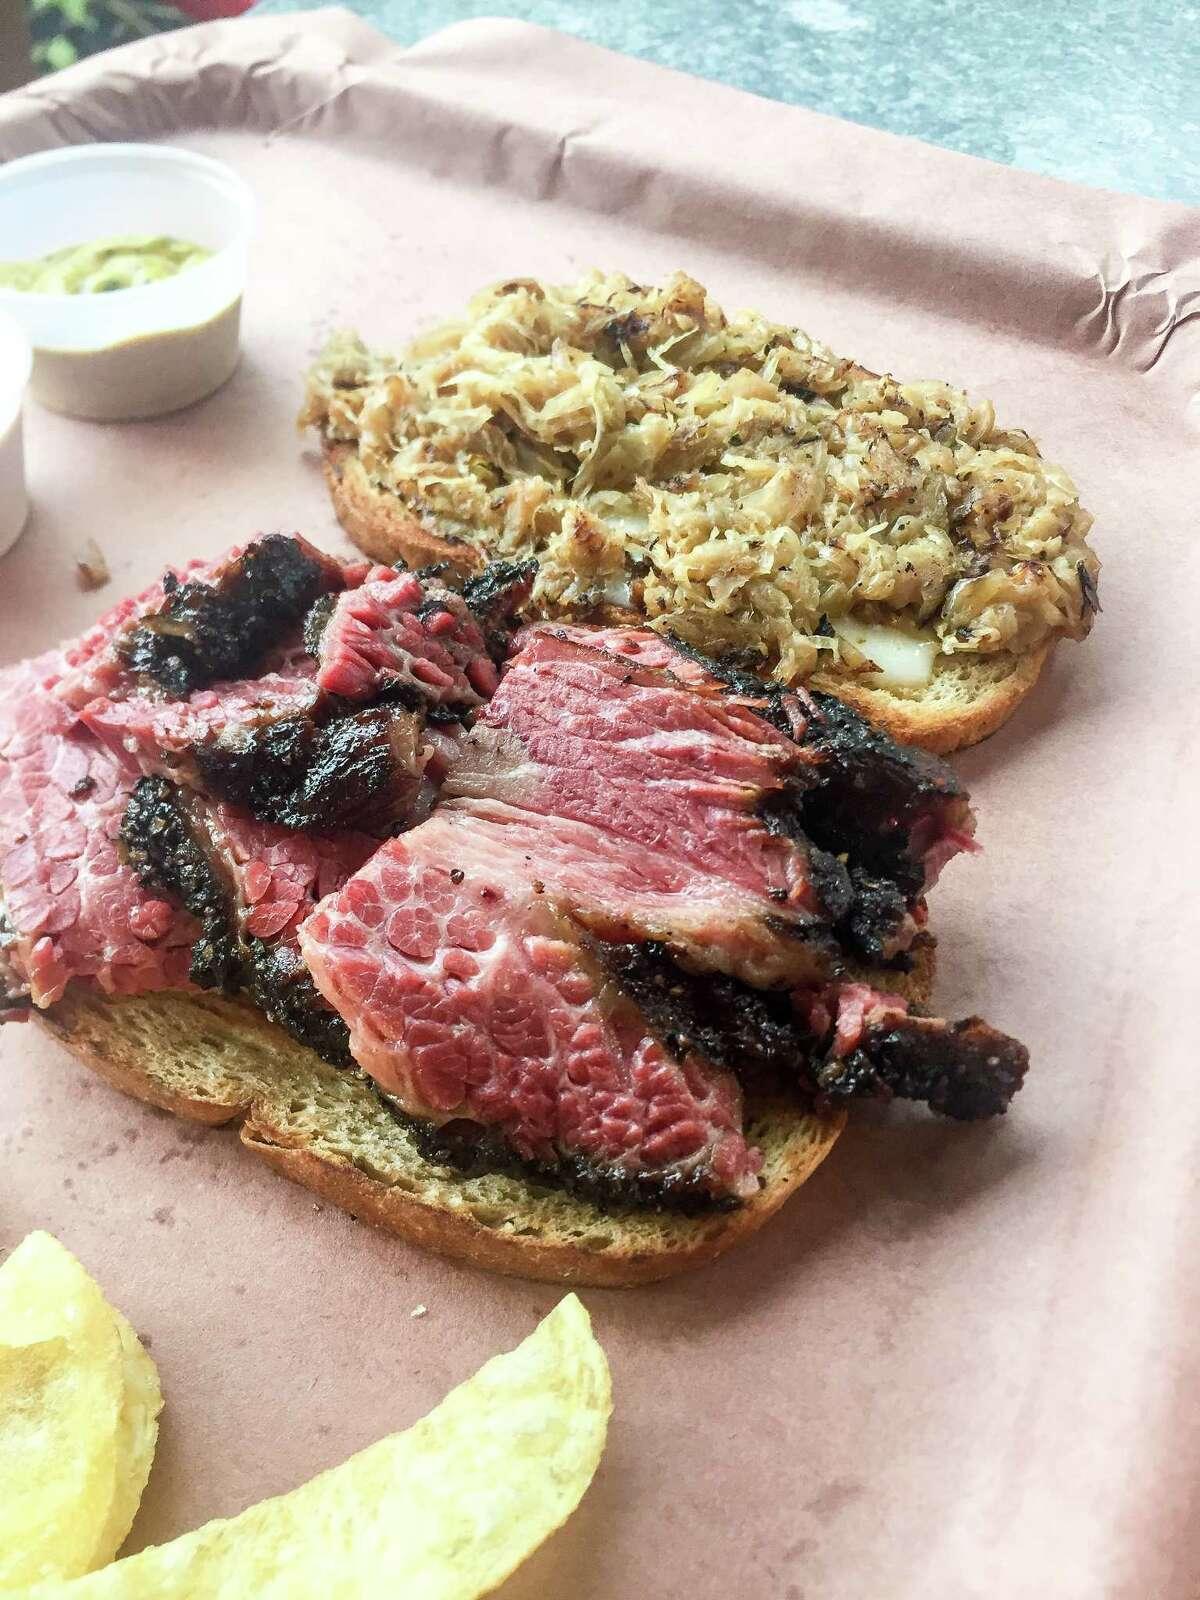 Reuben-style pastrami sandwich atTejas Chocolate Craftory